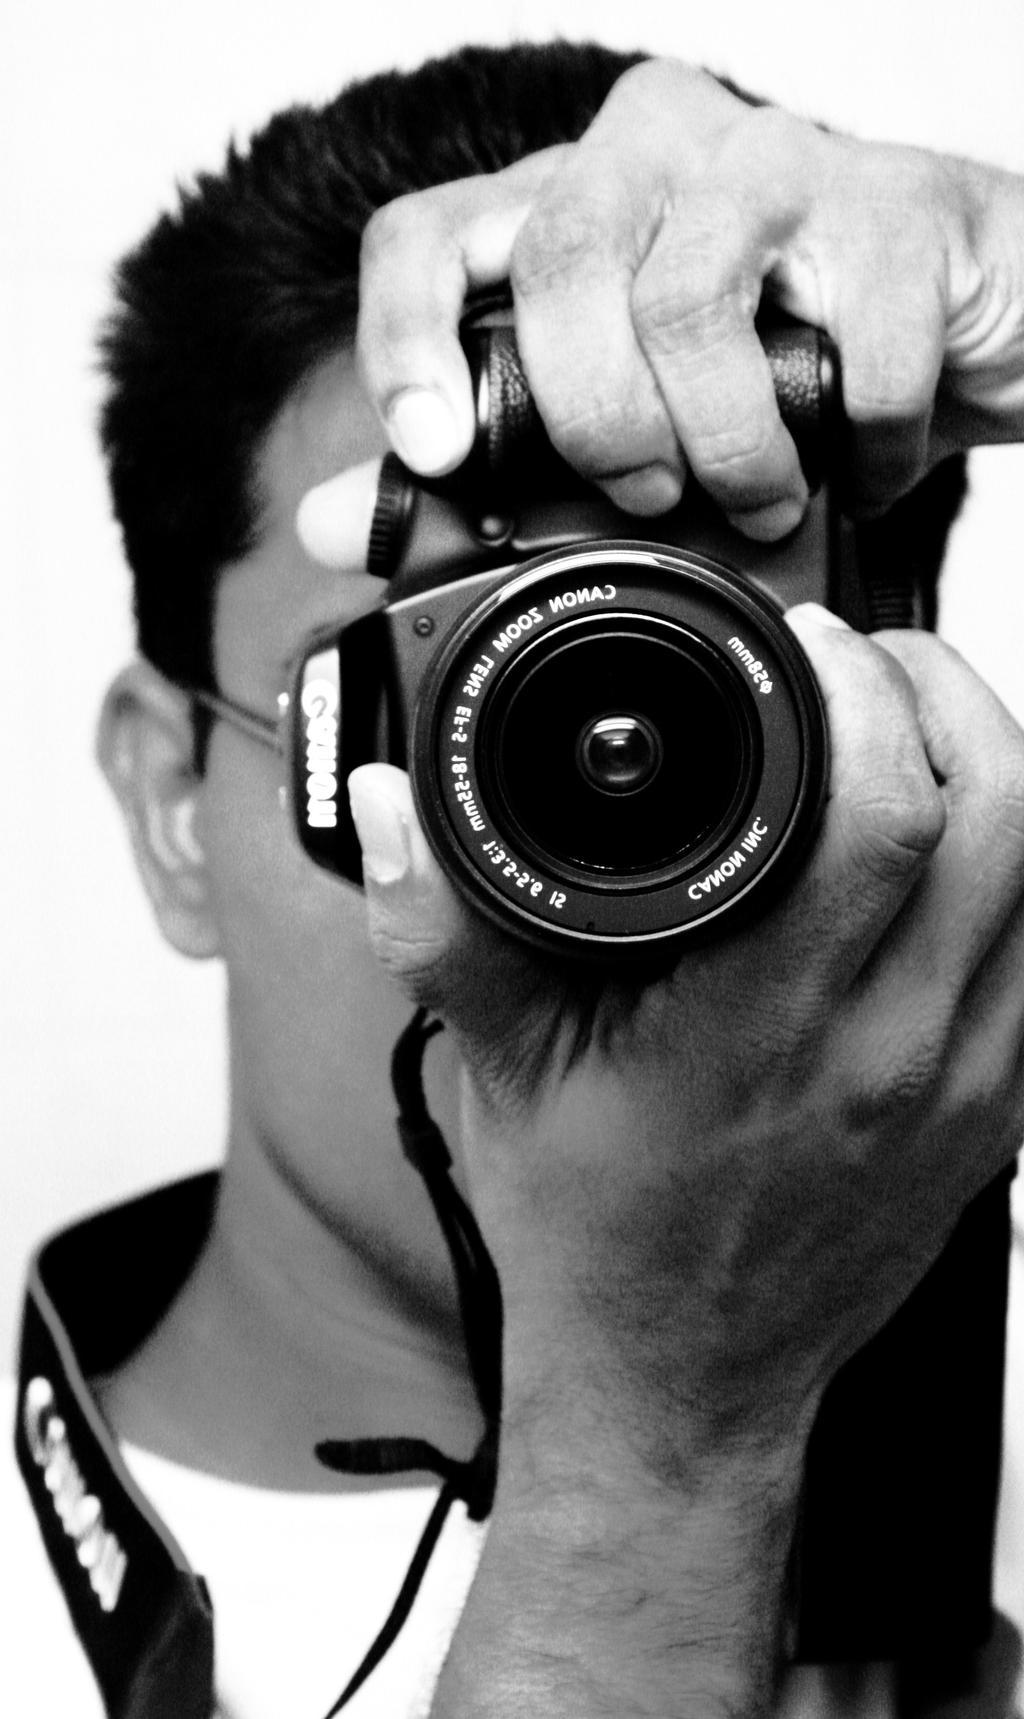 Loy-Pinheiro's Profile Picture